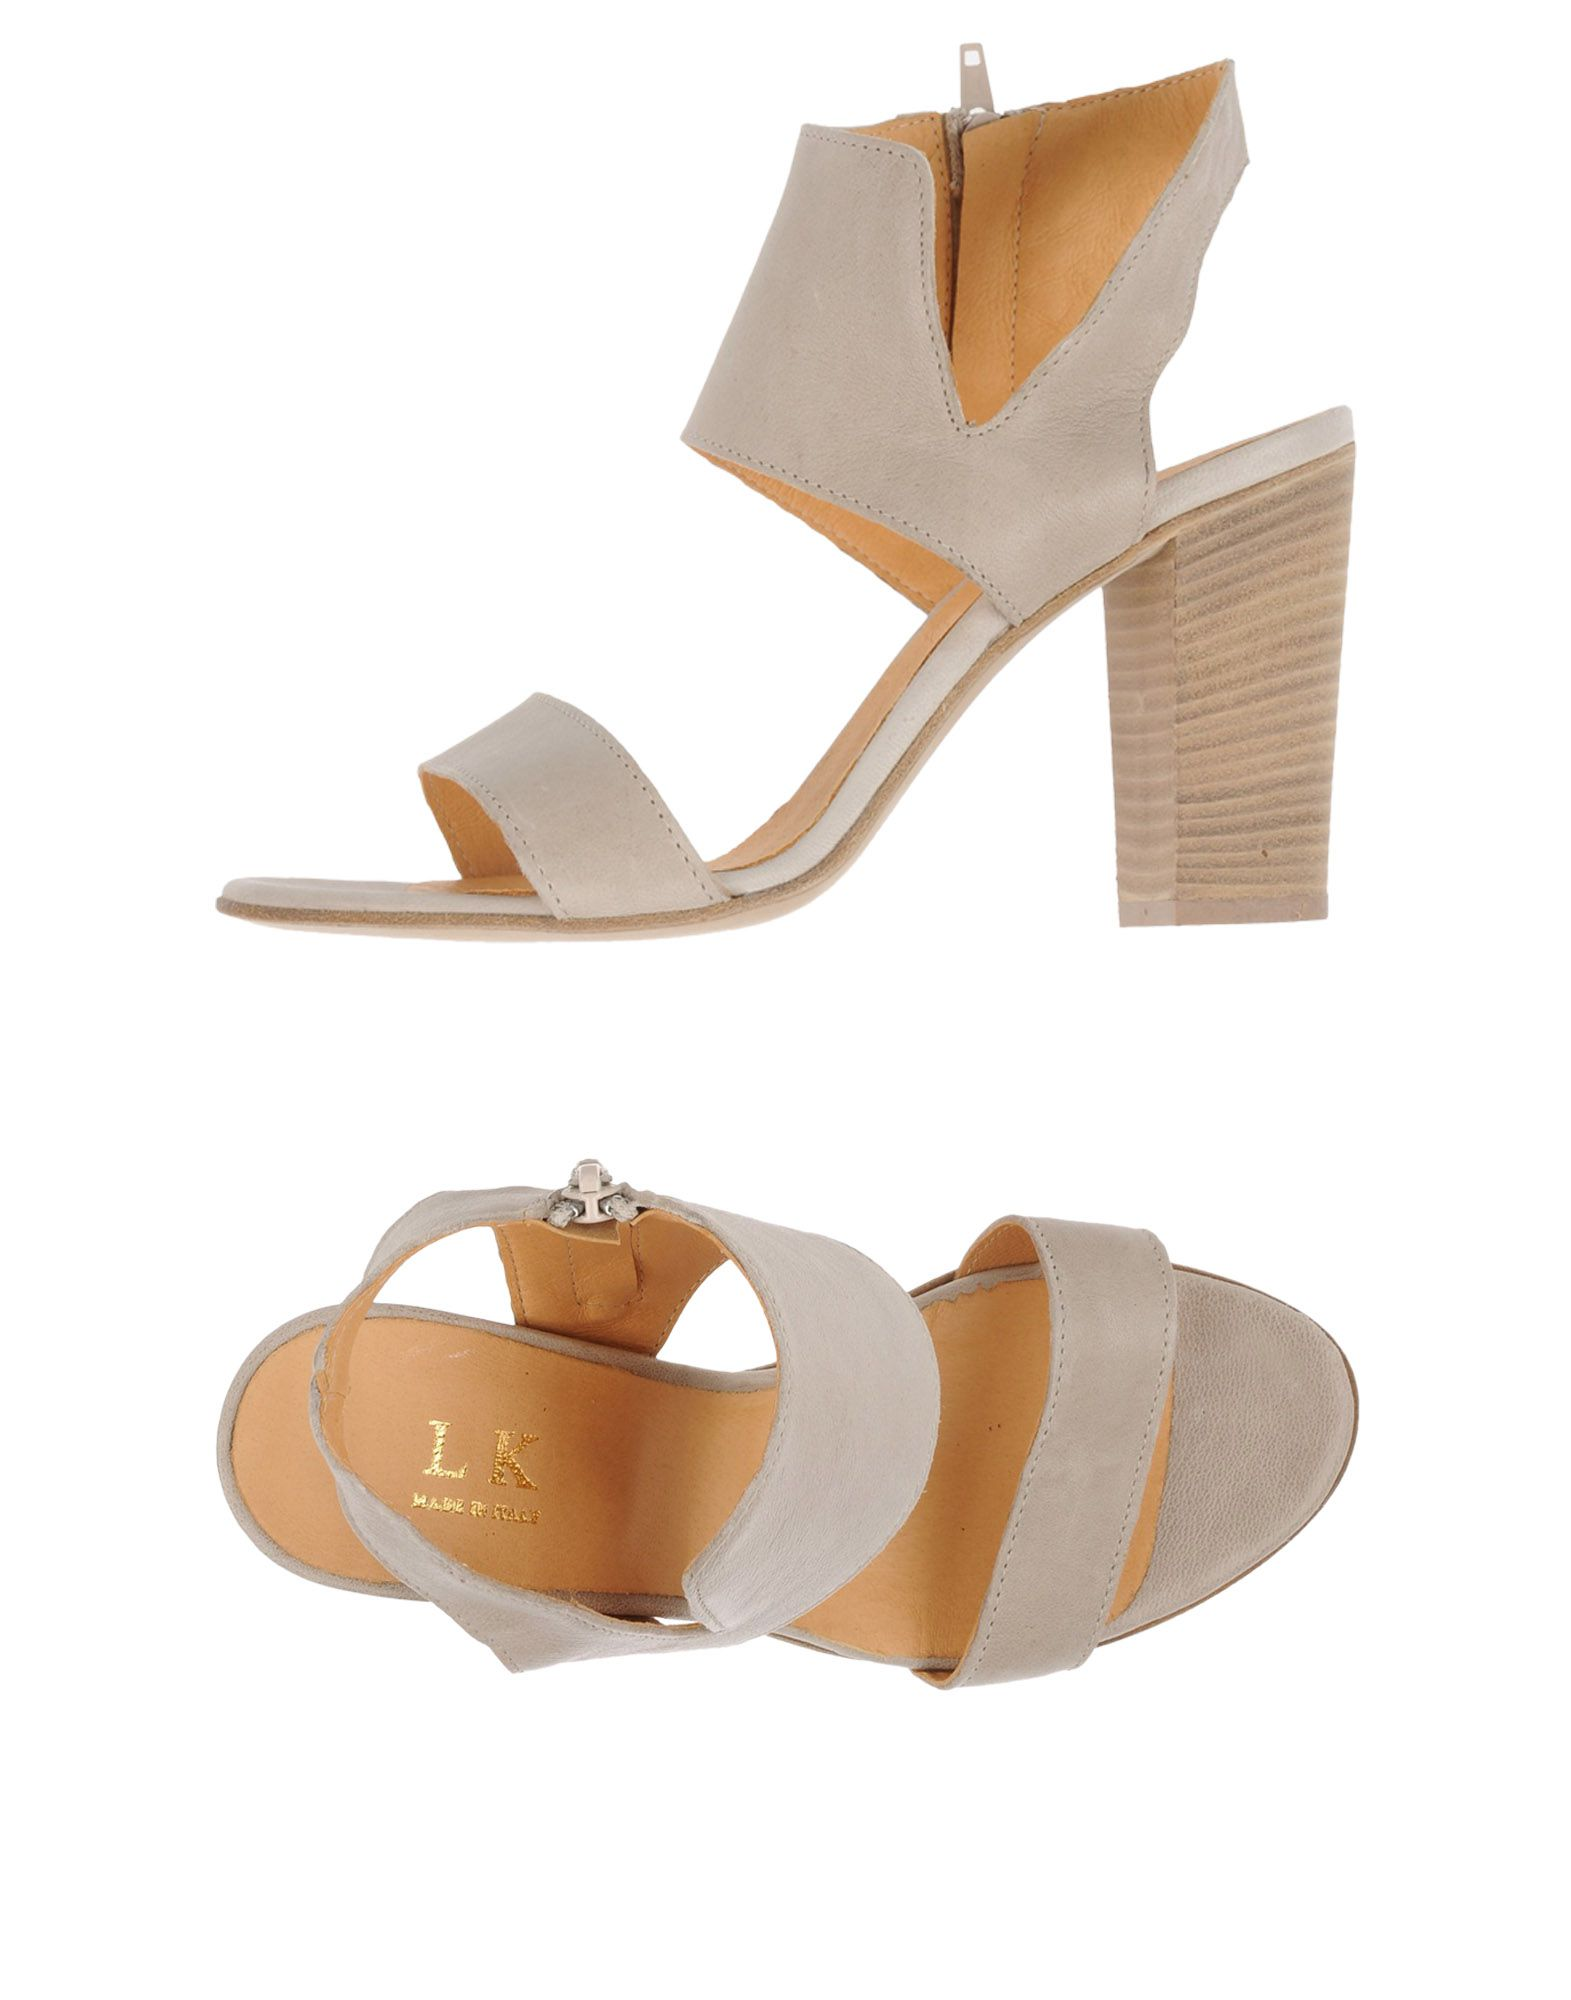 Lady Kiara Sandalen Damen  11209433AW Gute Qualität beliebte Schuhe